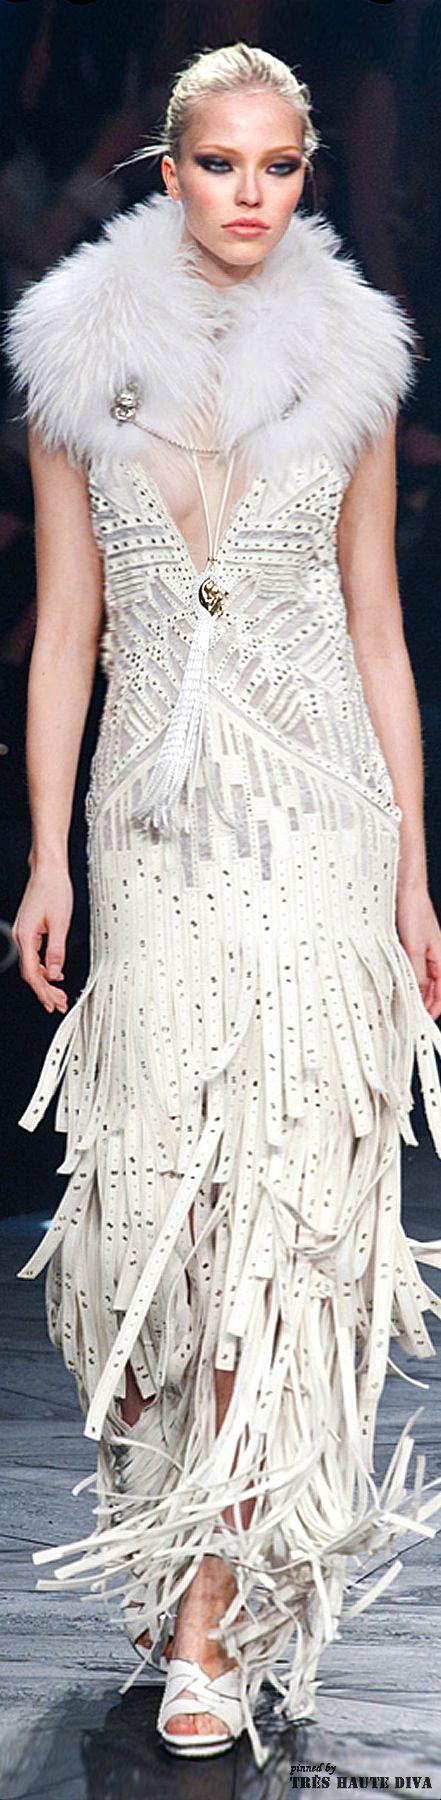 Milan Fashion Week Roberto Cavalli Fall/Winter 2014 | The House of Beccaria#